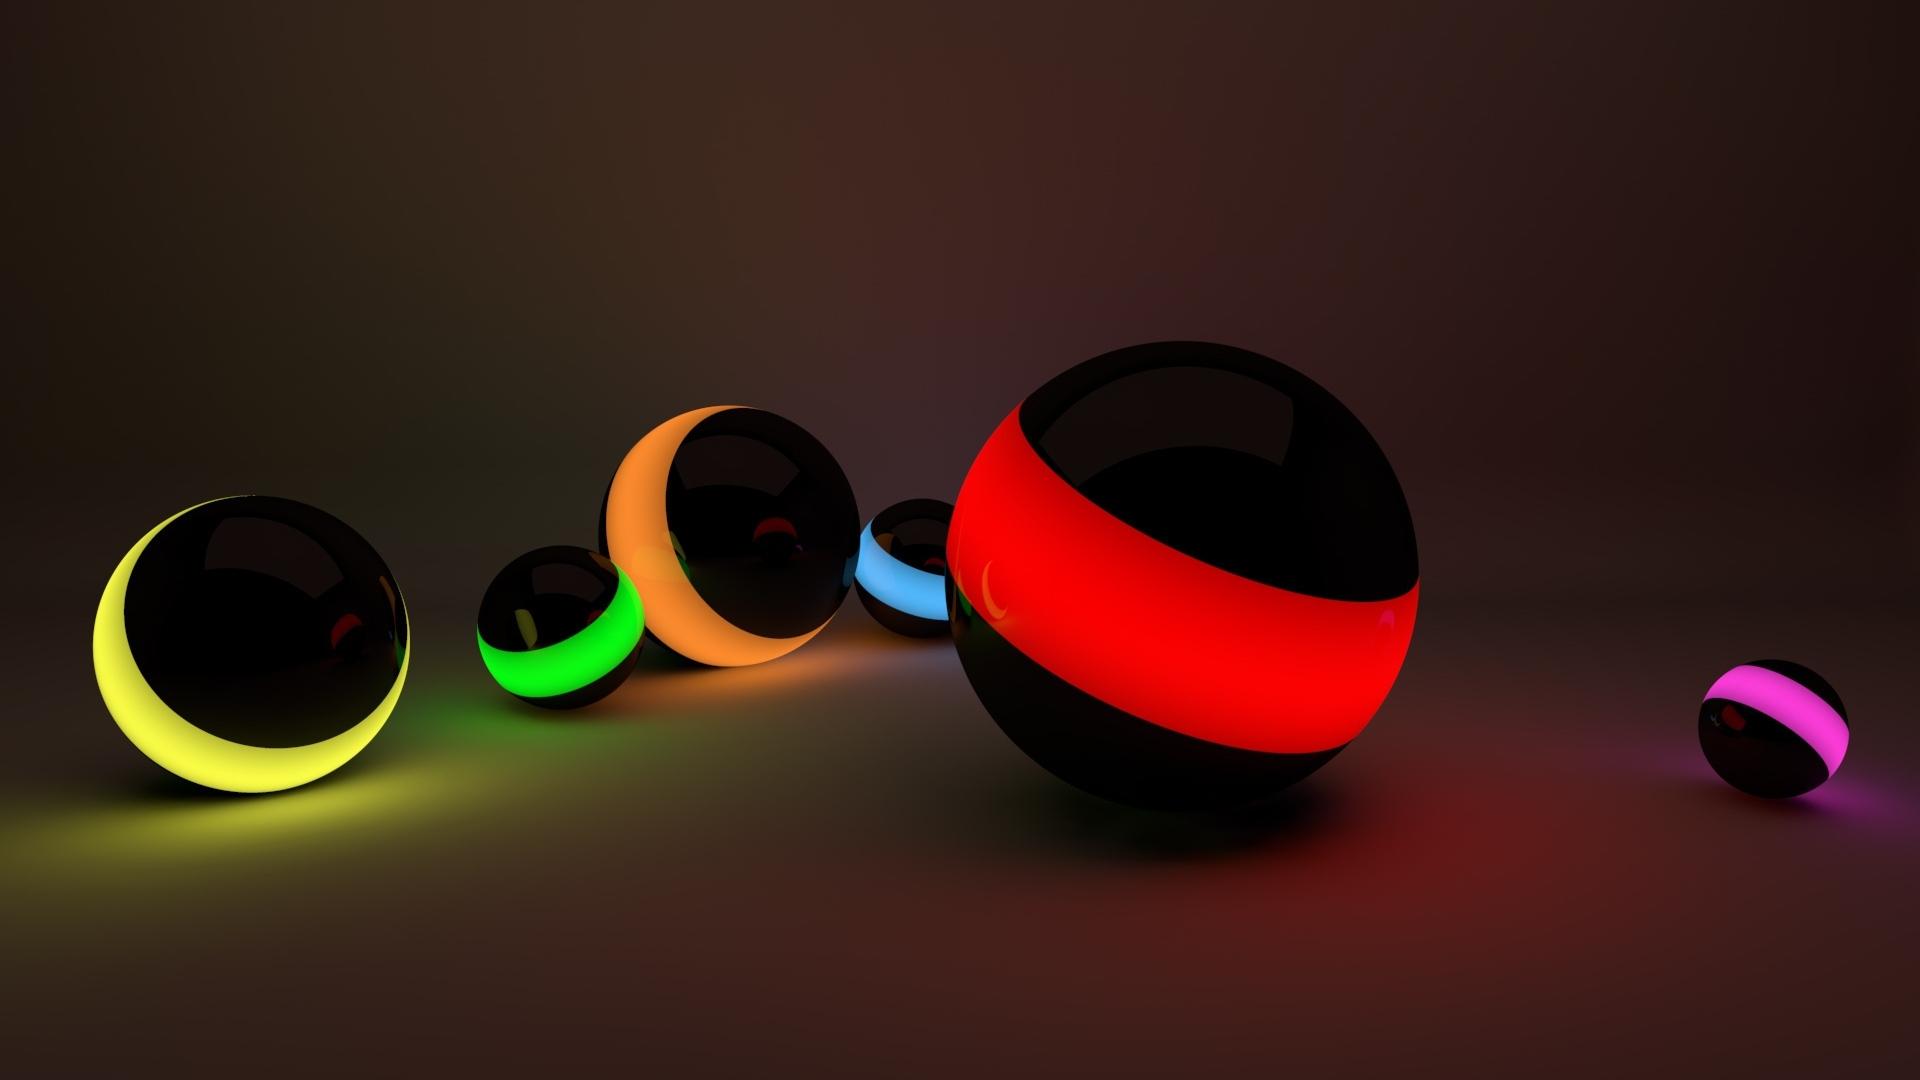 1920x1080-balls-lines-neon-lights-wallpaper-wp340914